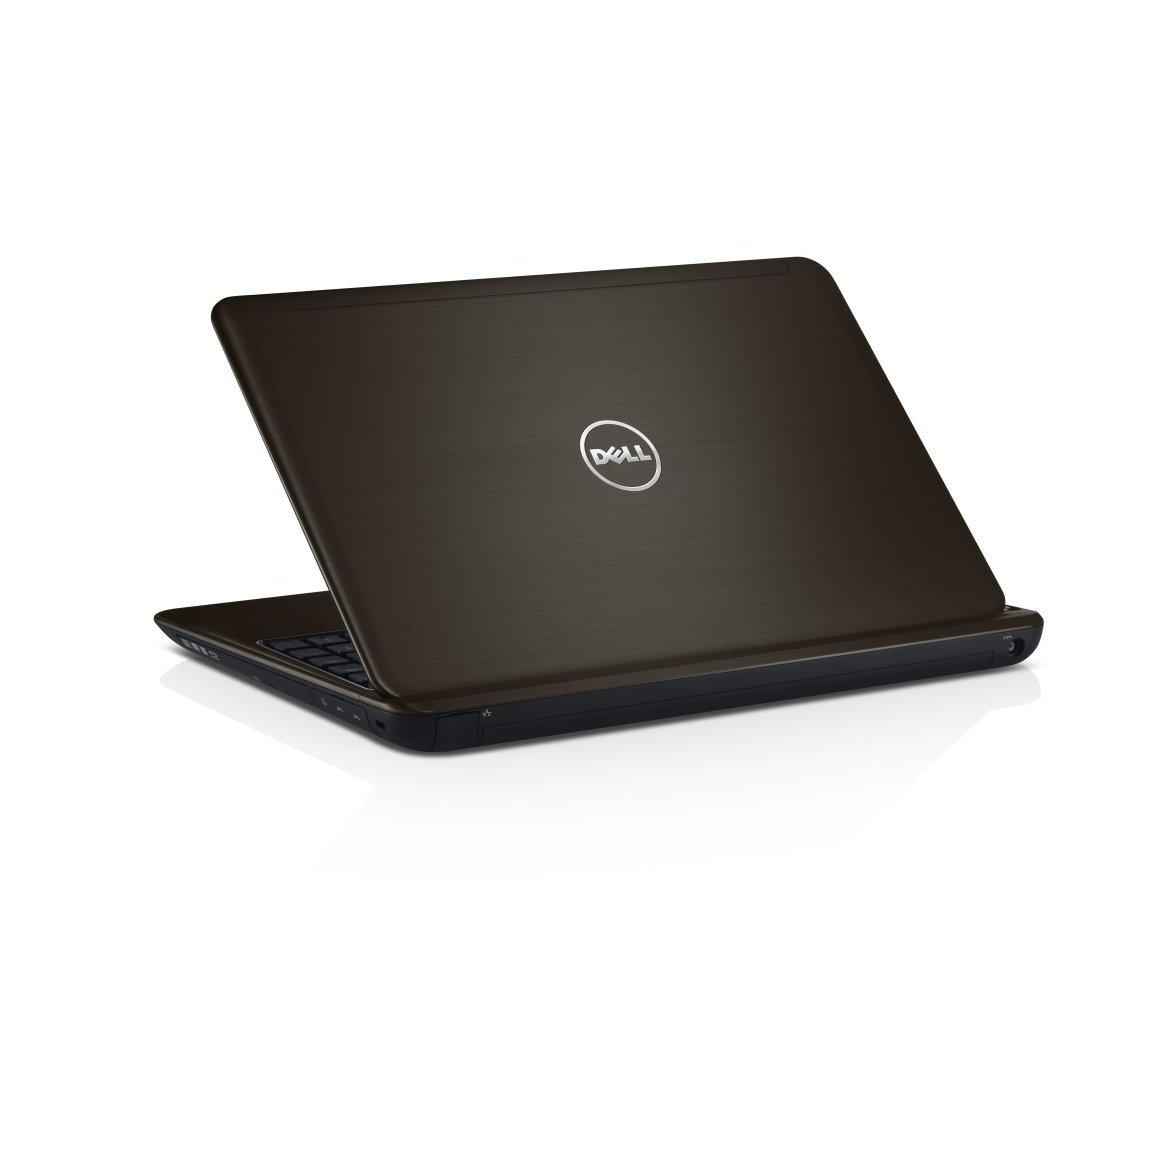 https://thetechjournal.com/wp-content/uploads/images/1204/1333304418-dell-inspiron-i14z2877bk-14inch-laptop-4.jpg